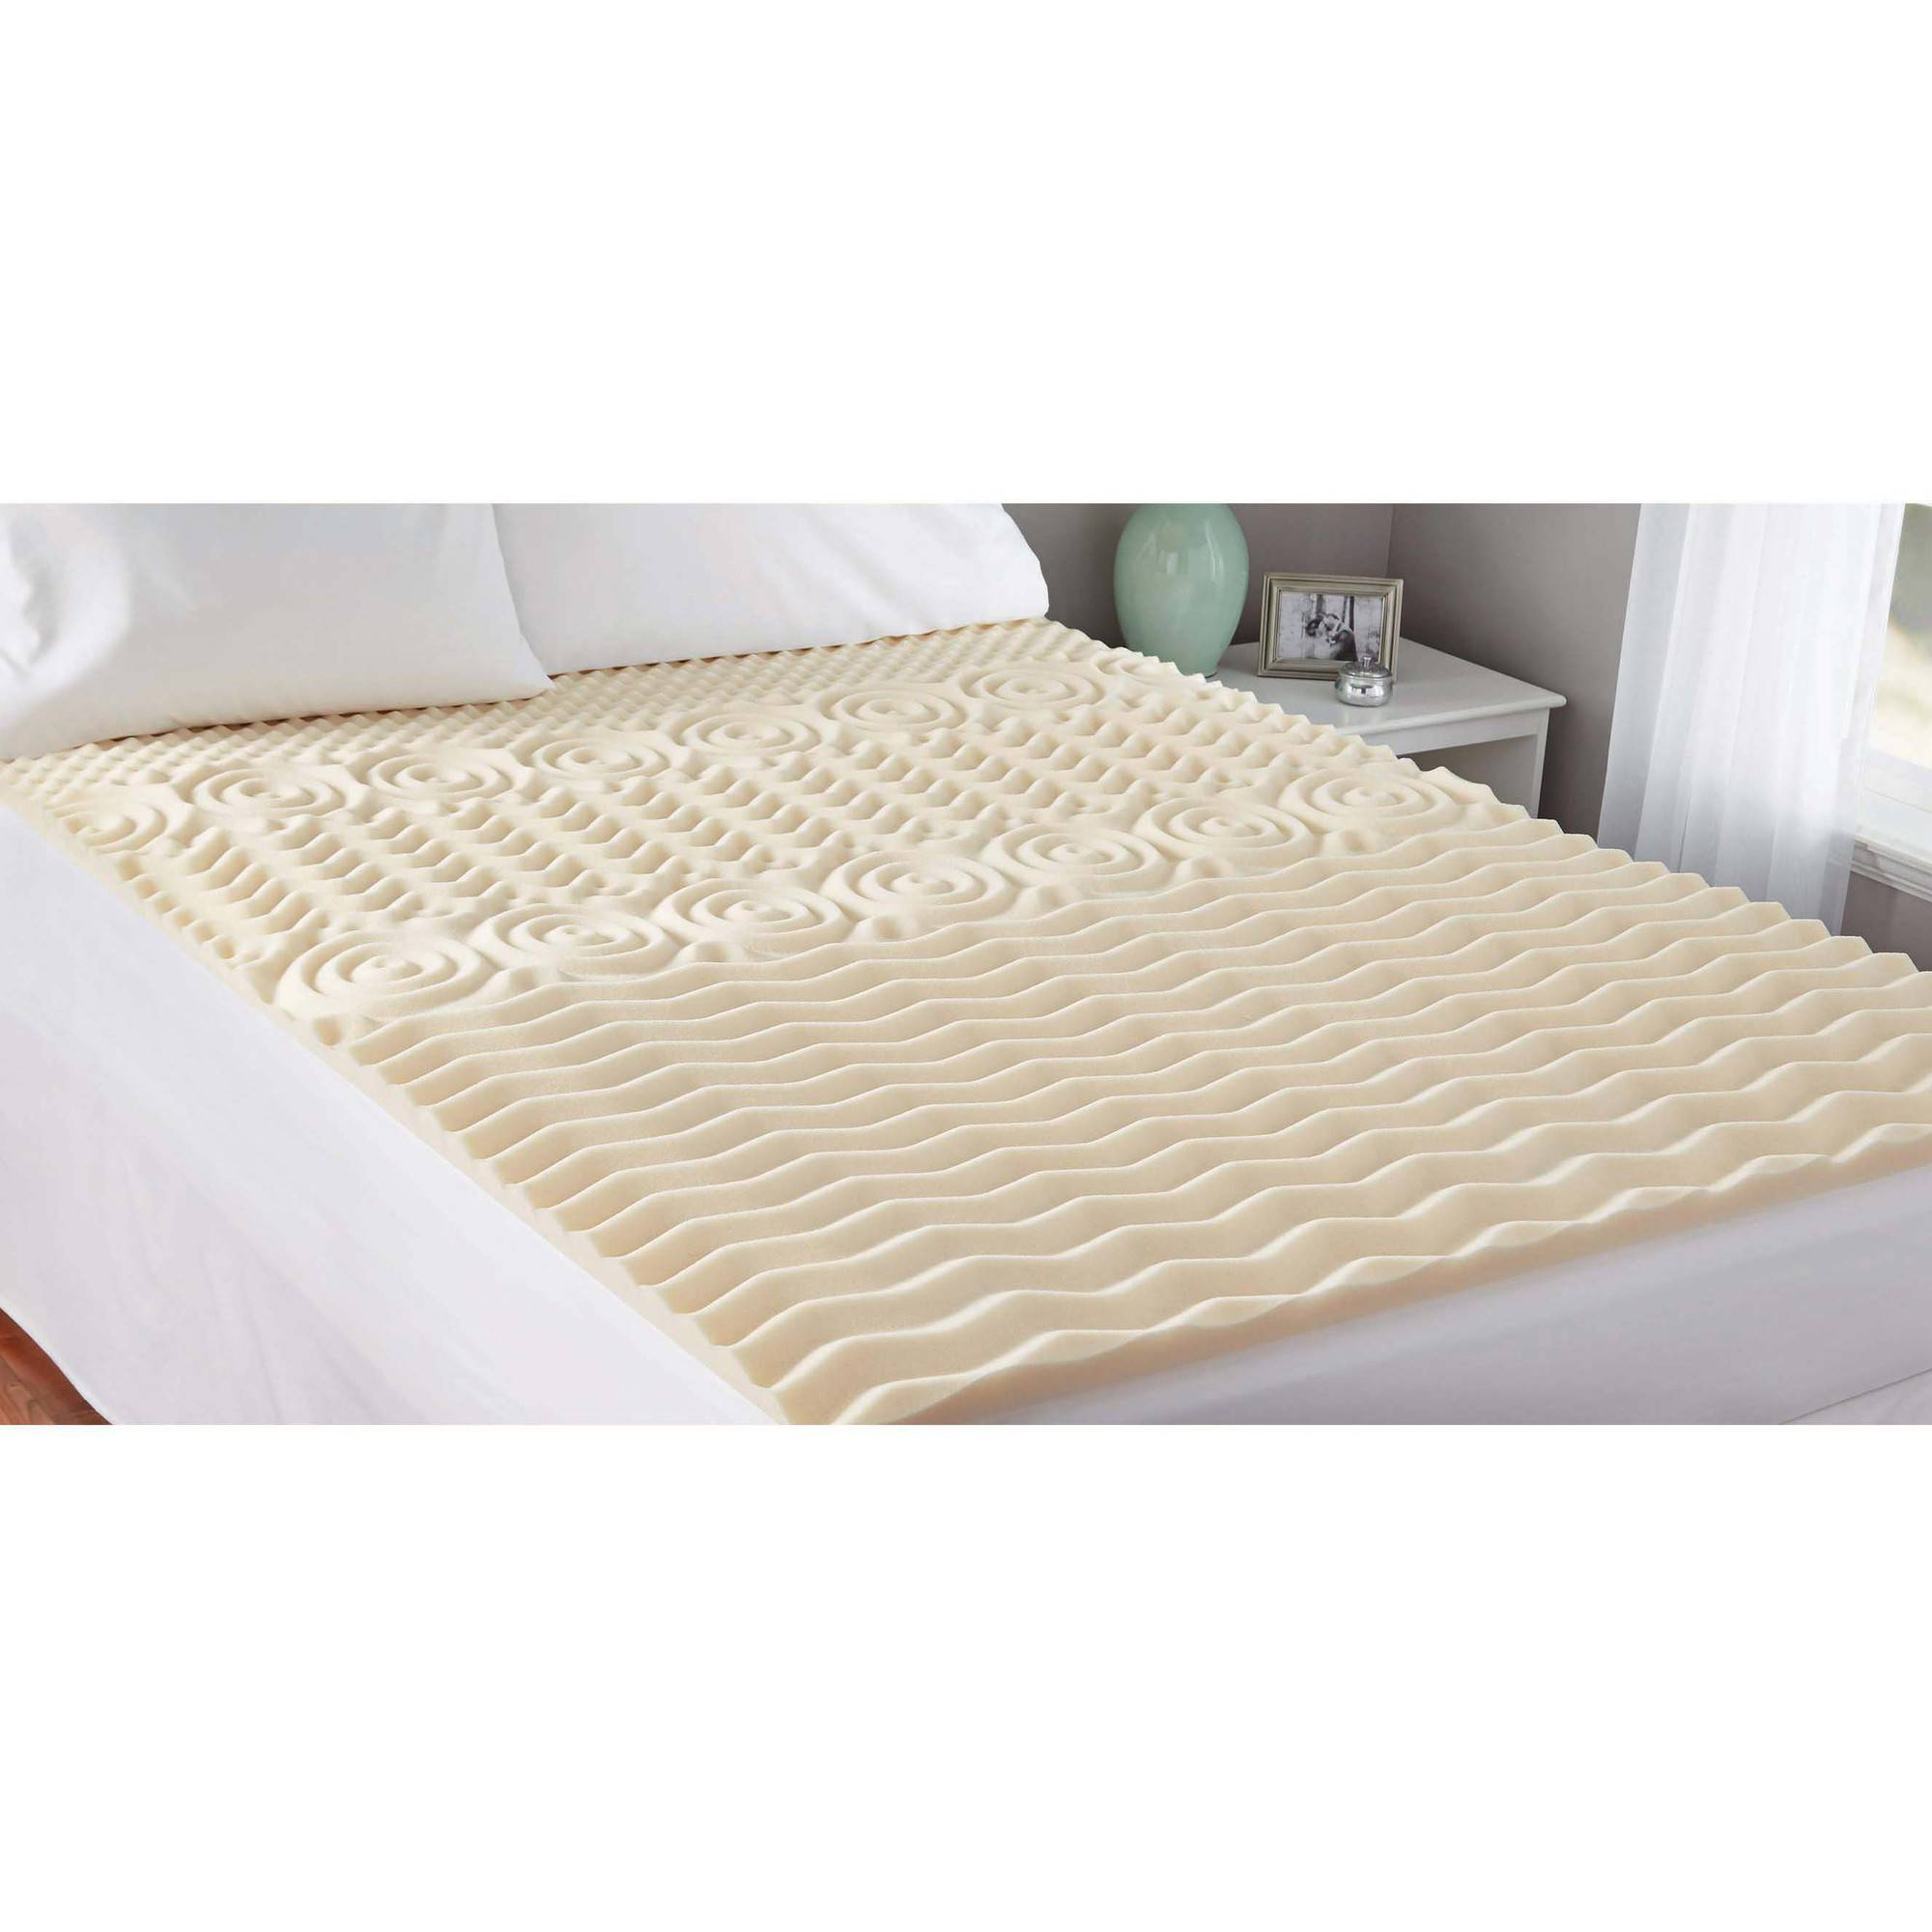 Home design mattress pad 28 images home design waterproof mattress pad 2017 2018 new home - Home design mattress pads ...